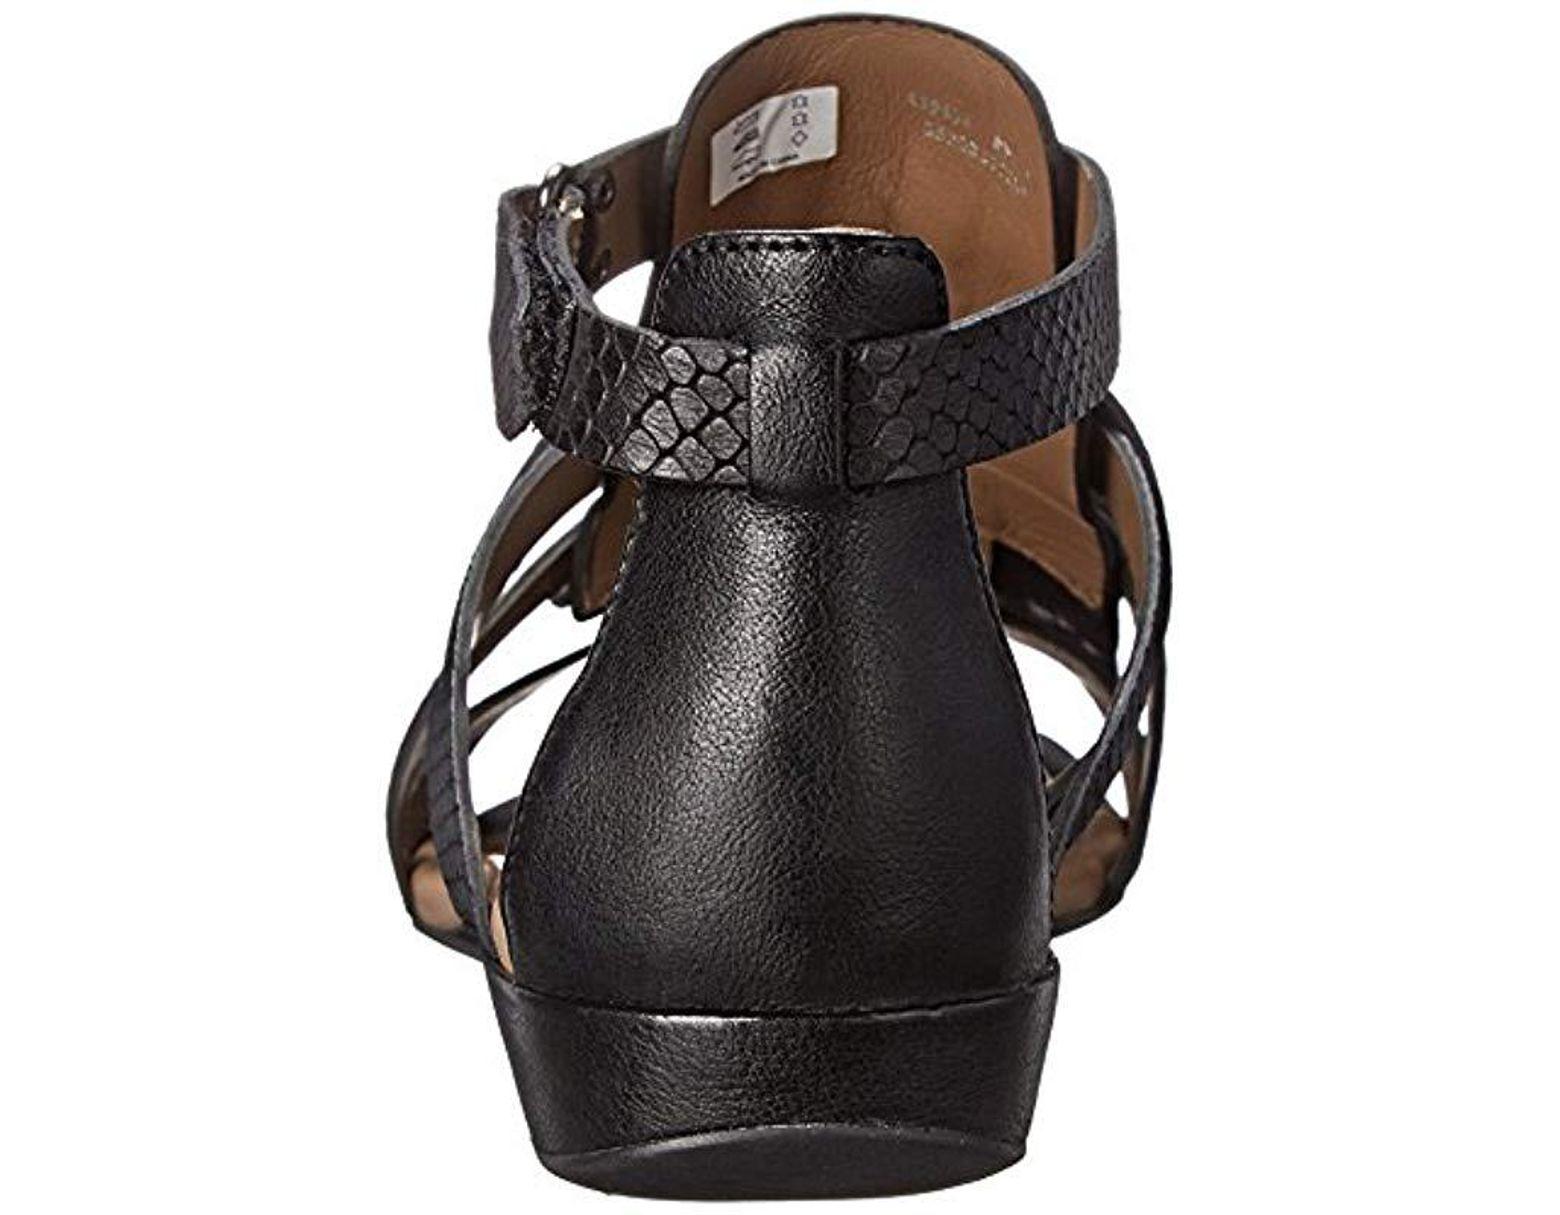 Sandal Footwear Gladiator S Bouillon In Black Ii Save 58Lyst Ecco nN0vwm8